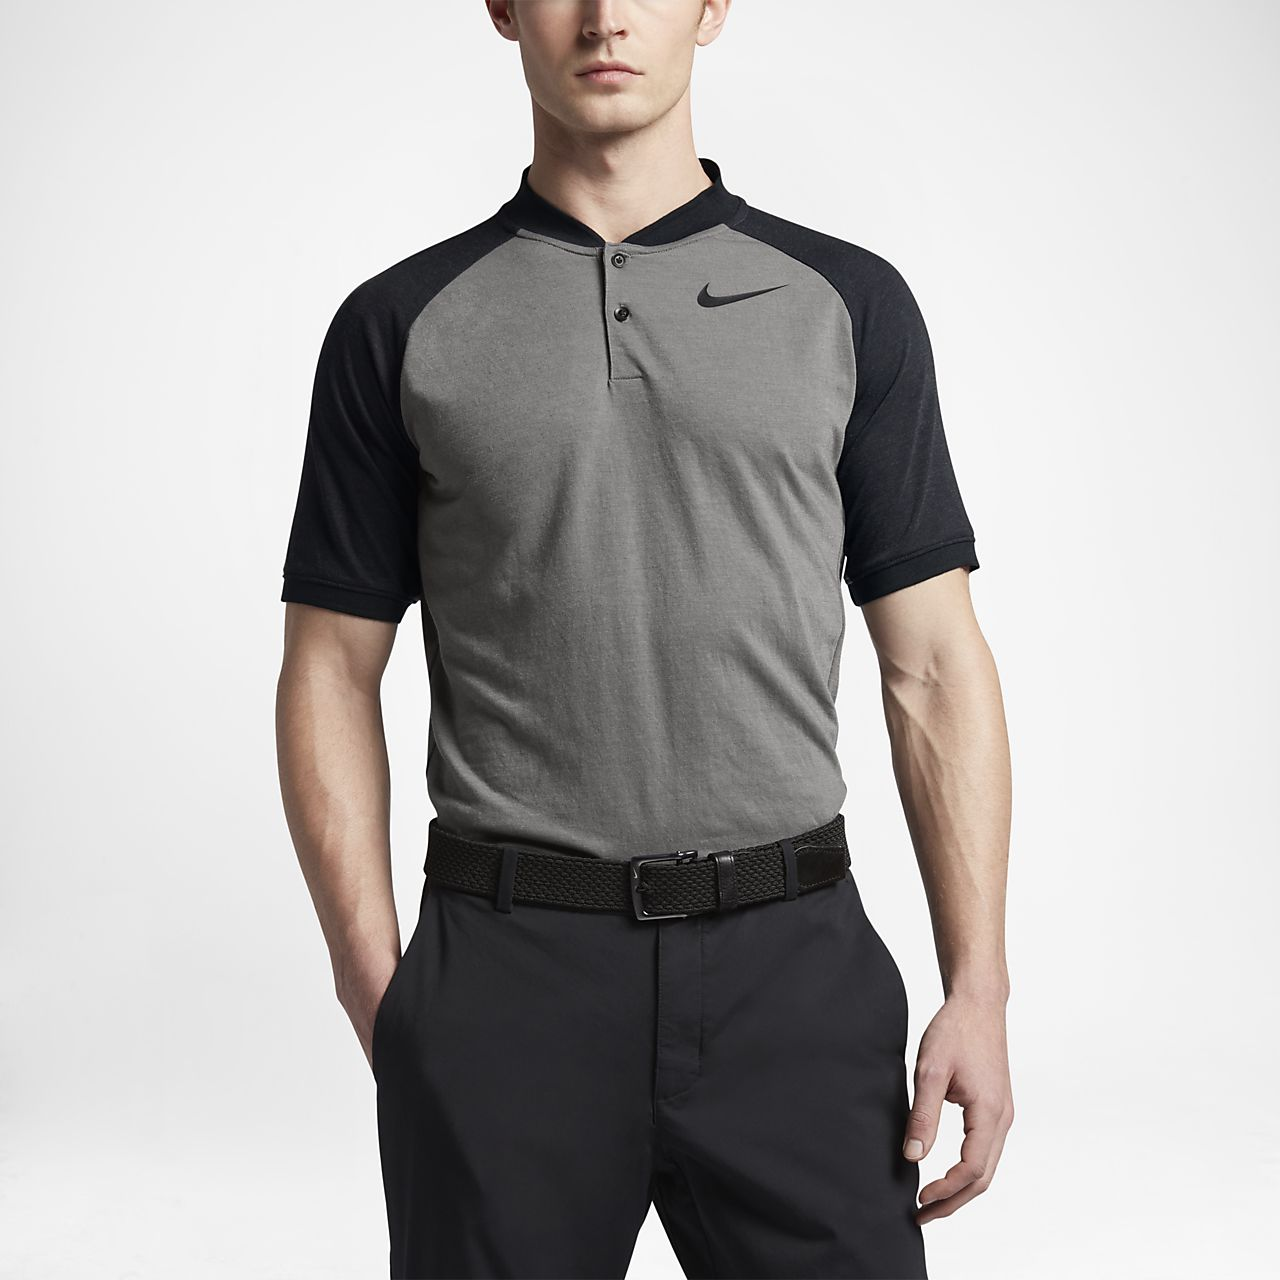 Nike Raglan Men's Slim Fit Golf Polo Shirts Dark Grey Heather/Black